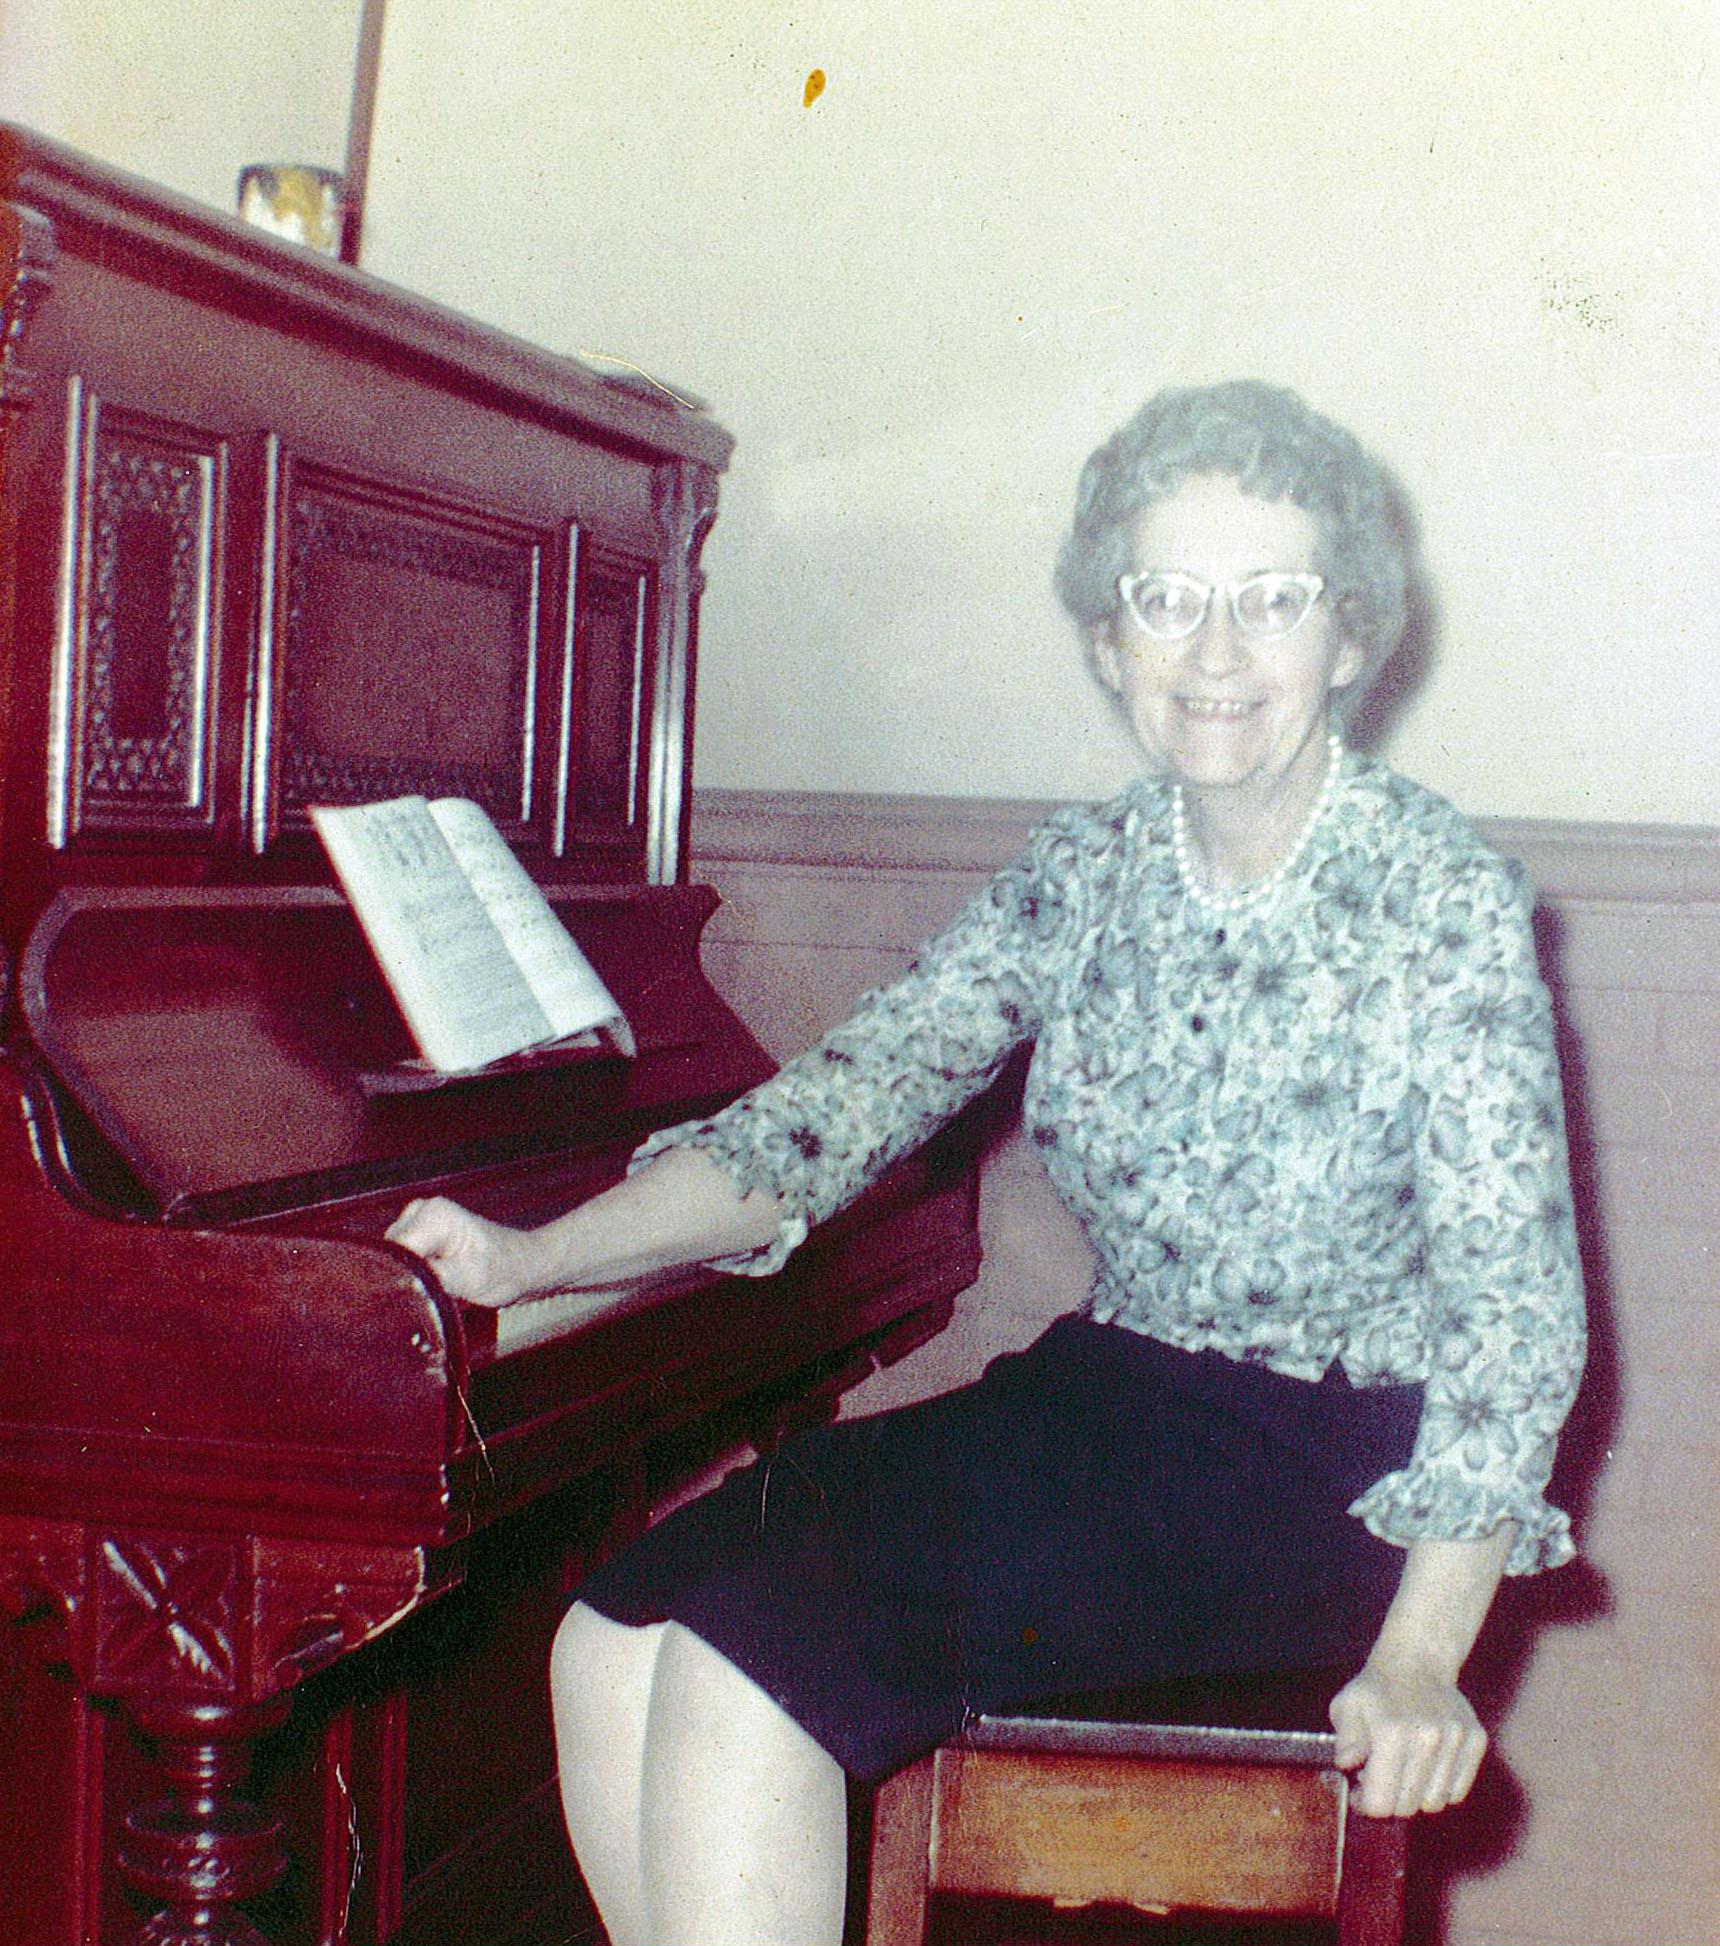 THE MARY G. (KERWIN) LOCKE '18, '58 ENDOWED MEMORIAL SCHOLARSHIP